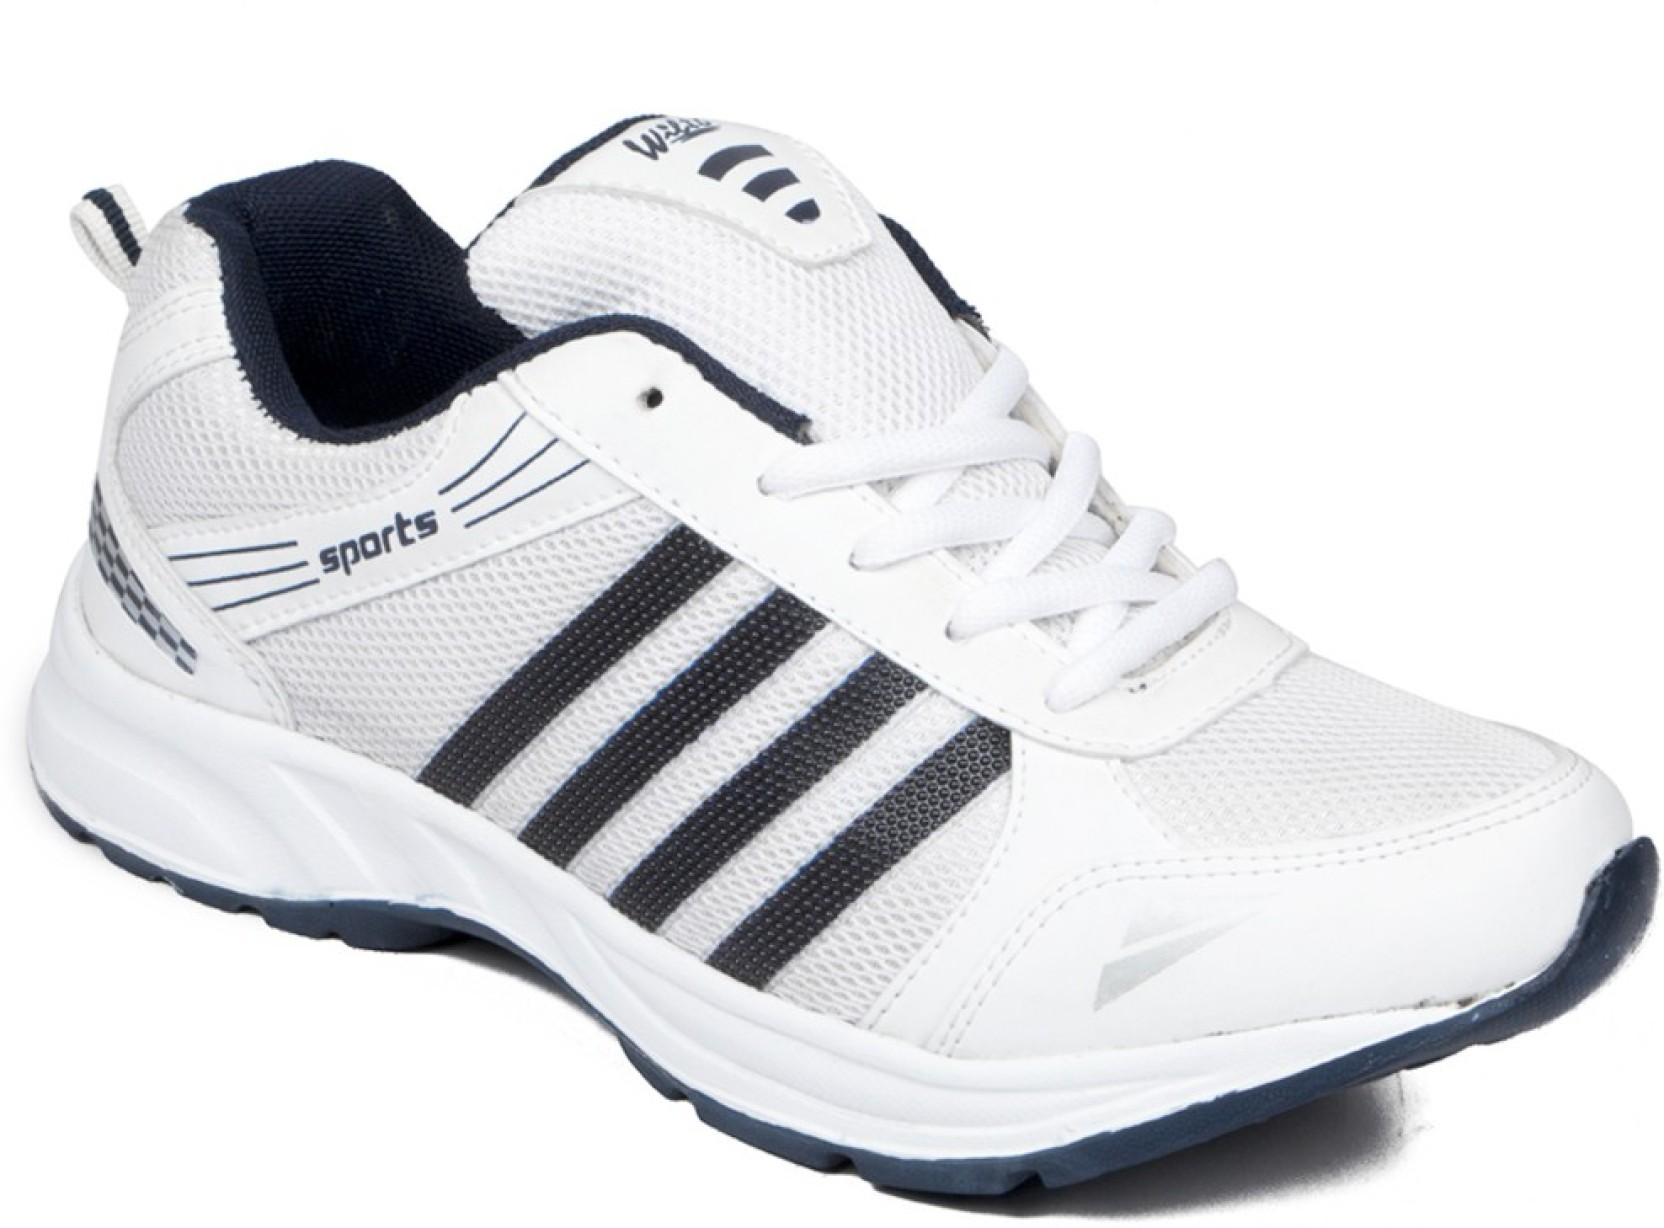 3e1d11ecaedf73 Asian WNDR-13 Training Shoes